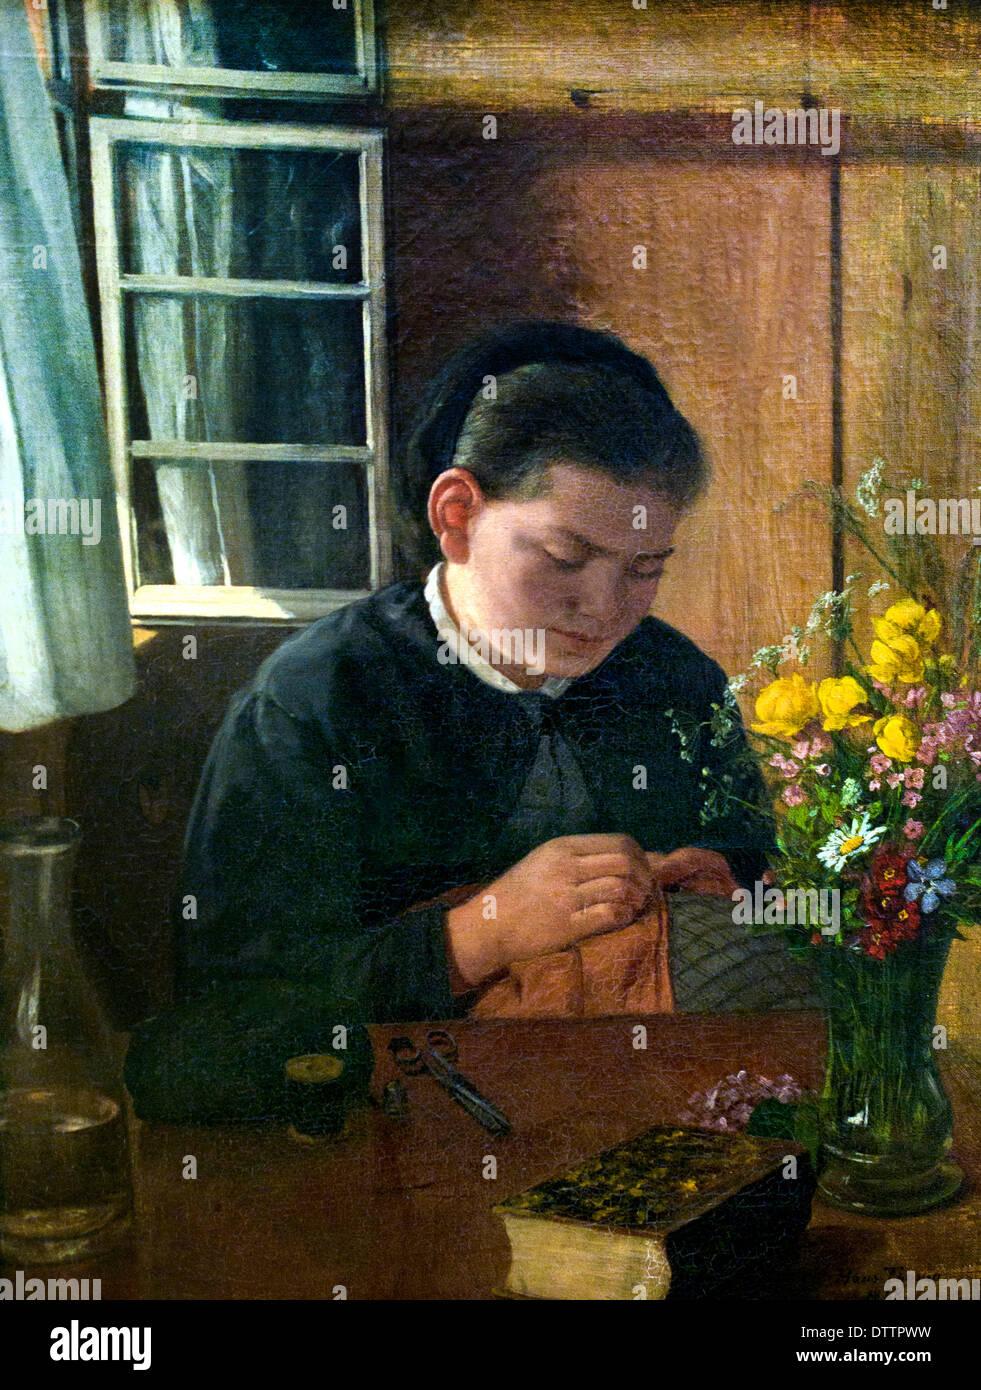 Nähendes Mädchen Agathe Schwester des Künstlers - Sewing girl Agathe sister of the artist 1868   Hans Thoma 1839 - 1924 German - Stock Image